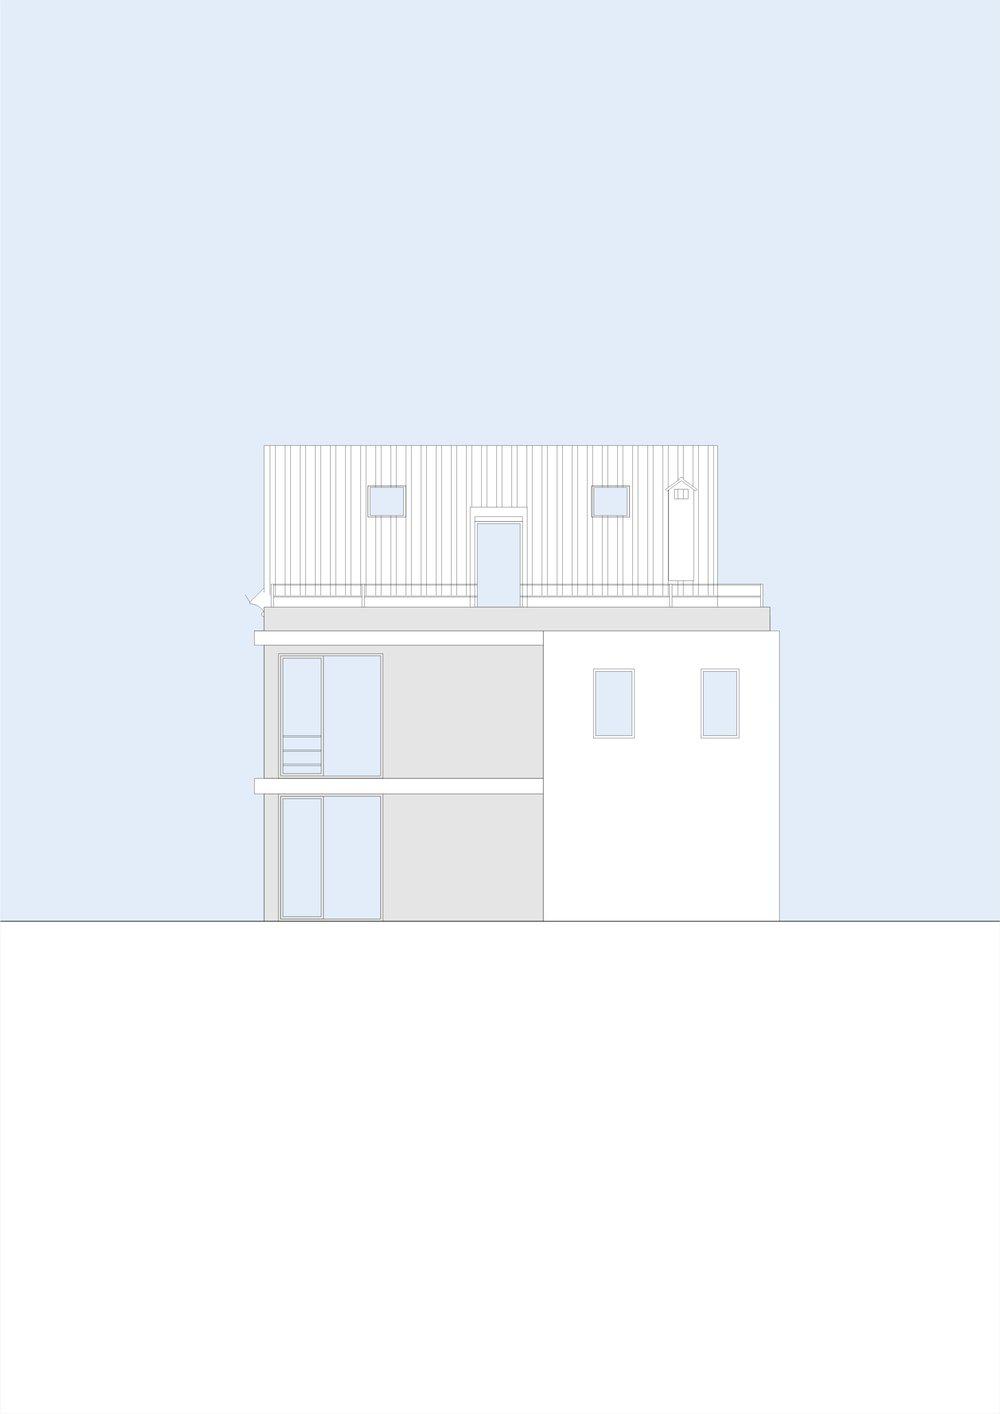 Quinta Eira Velha - Casa Campo - Aldeia Mato - Castelo Bode - Abrantes - Paulo Miguez Arquitectos 6.jpg